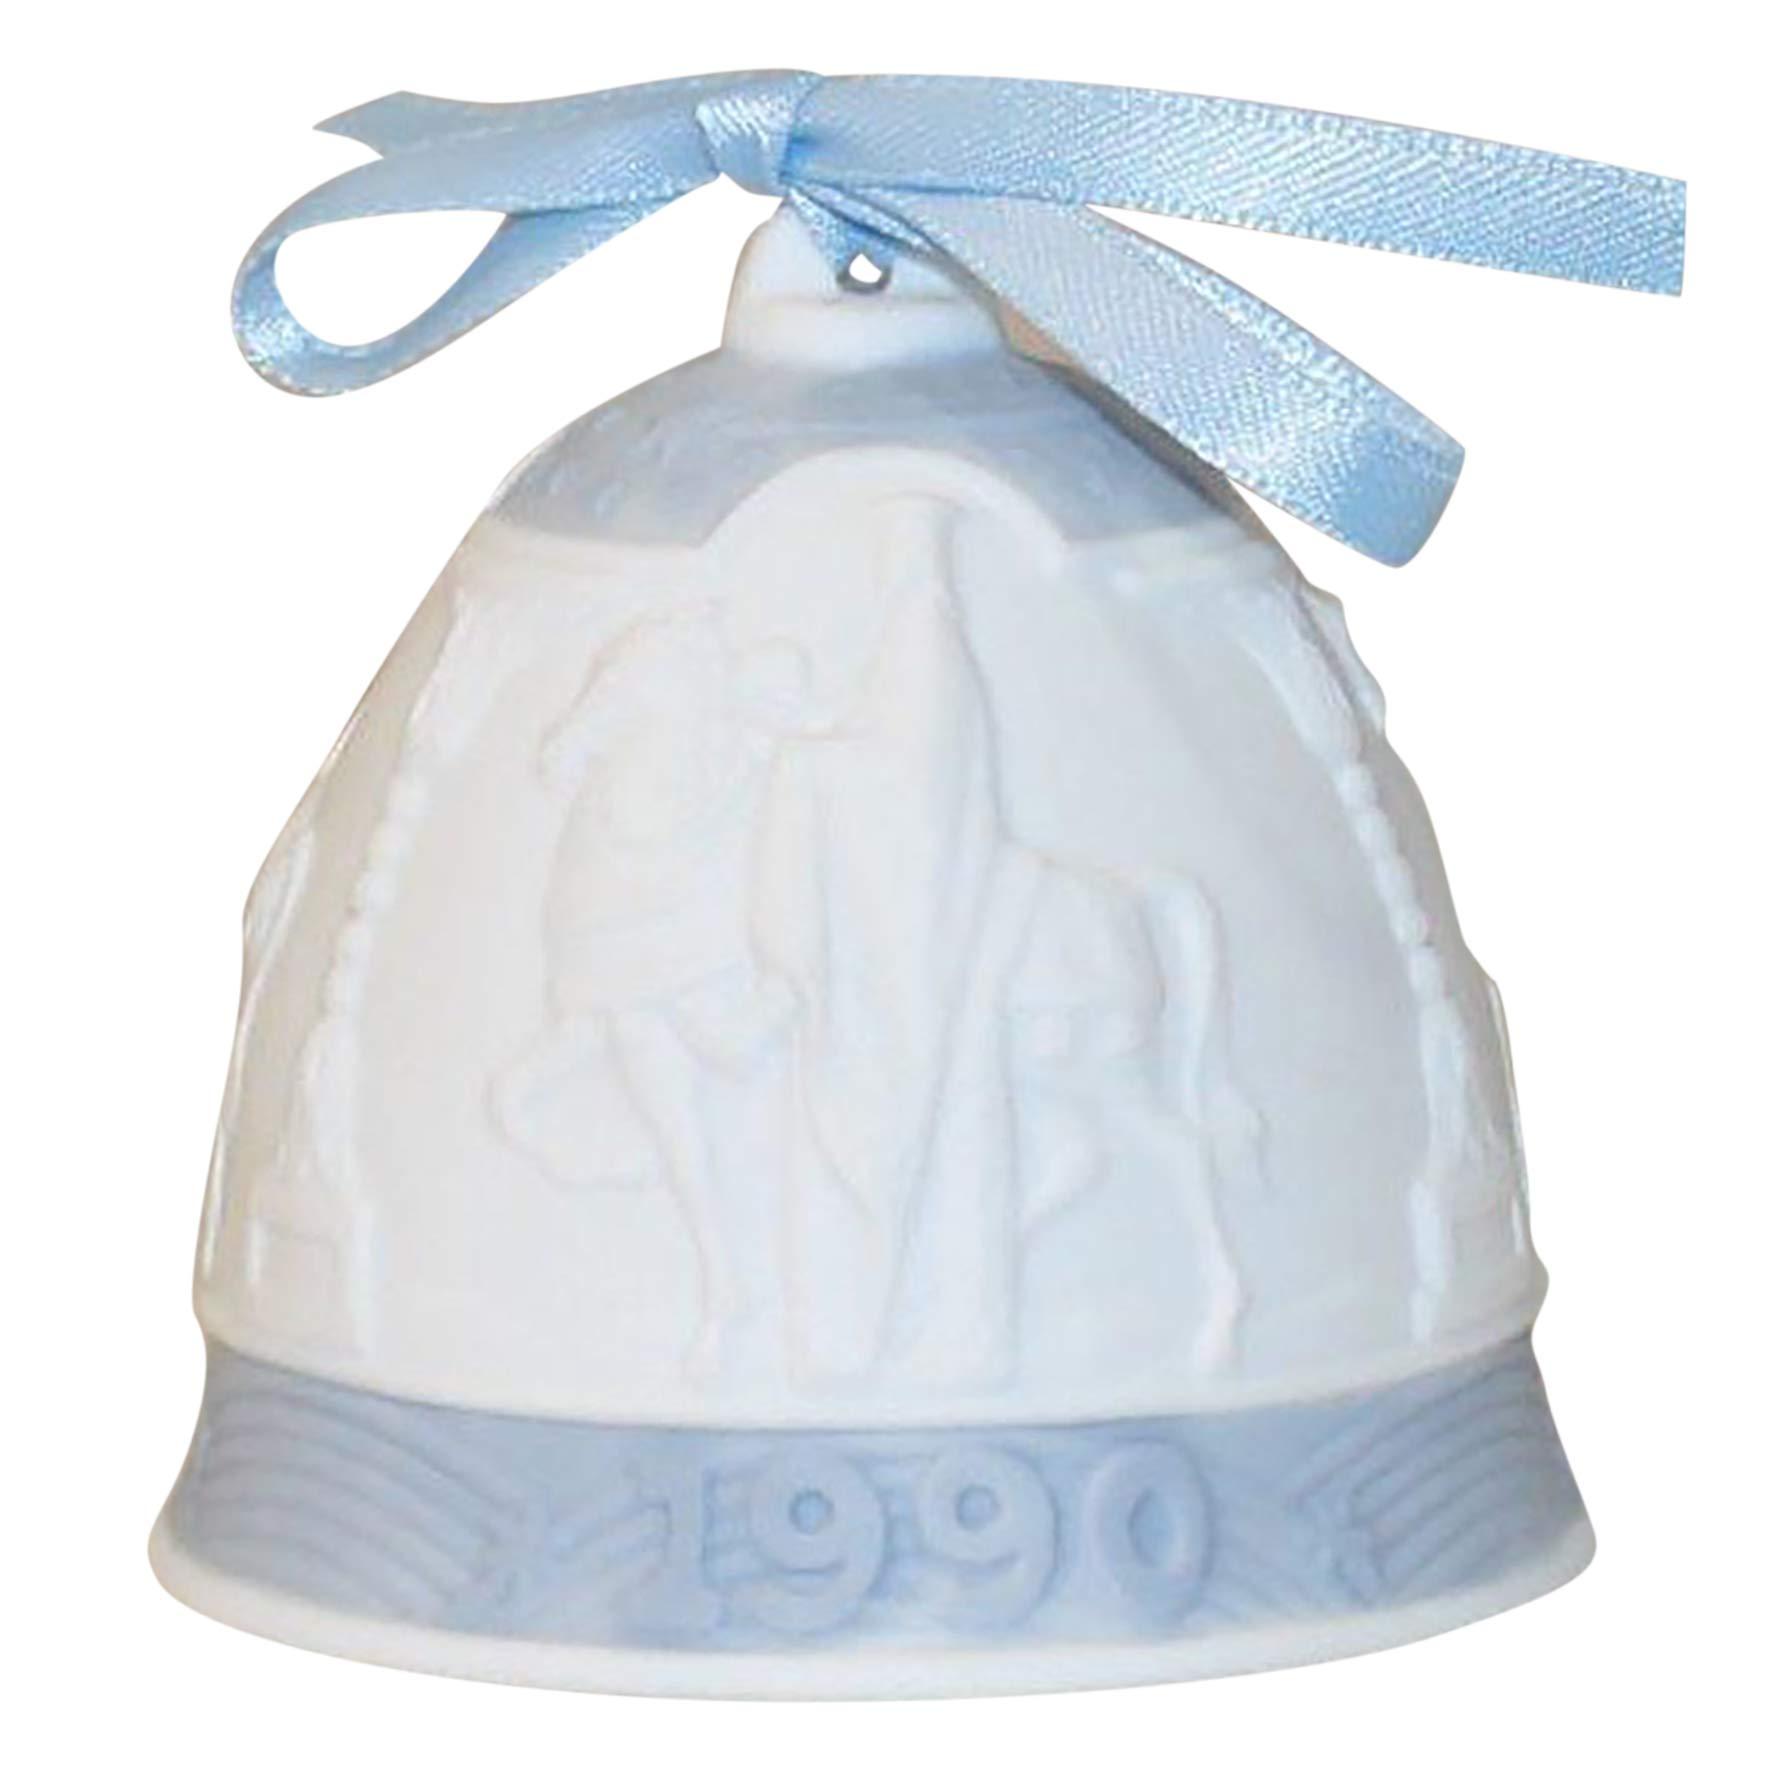 Lladro 1990 Christmas Porcelain Bell